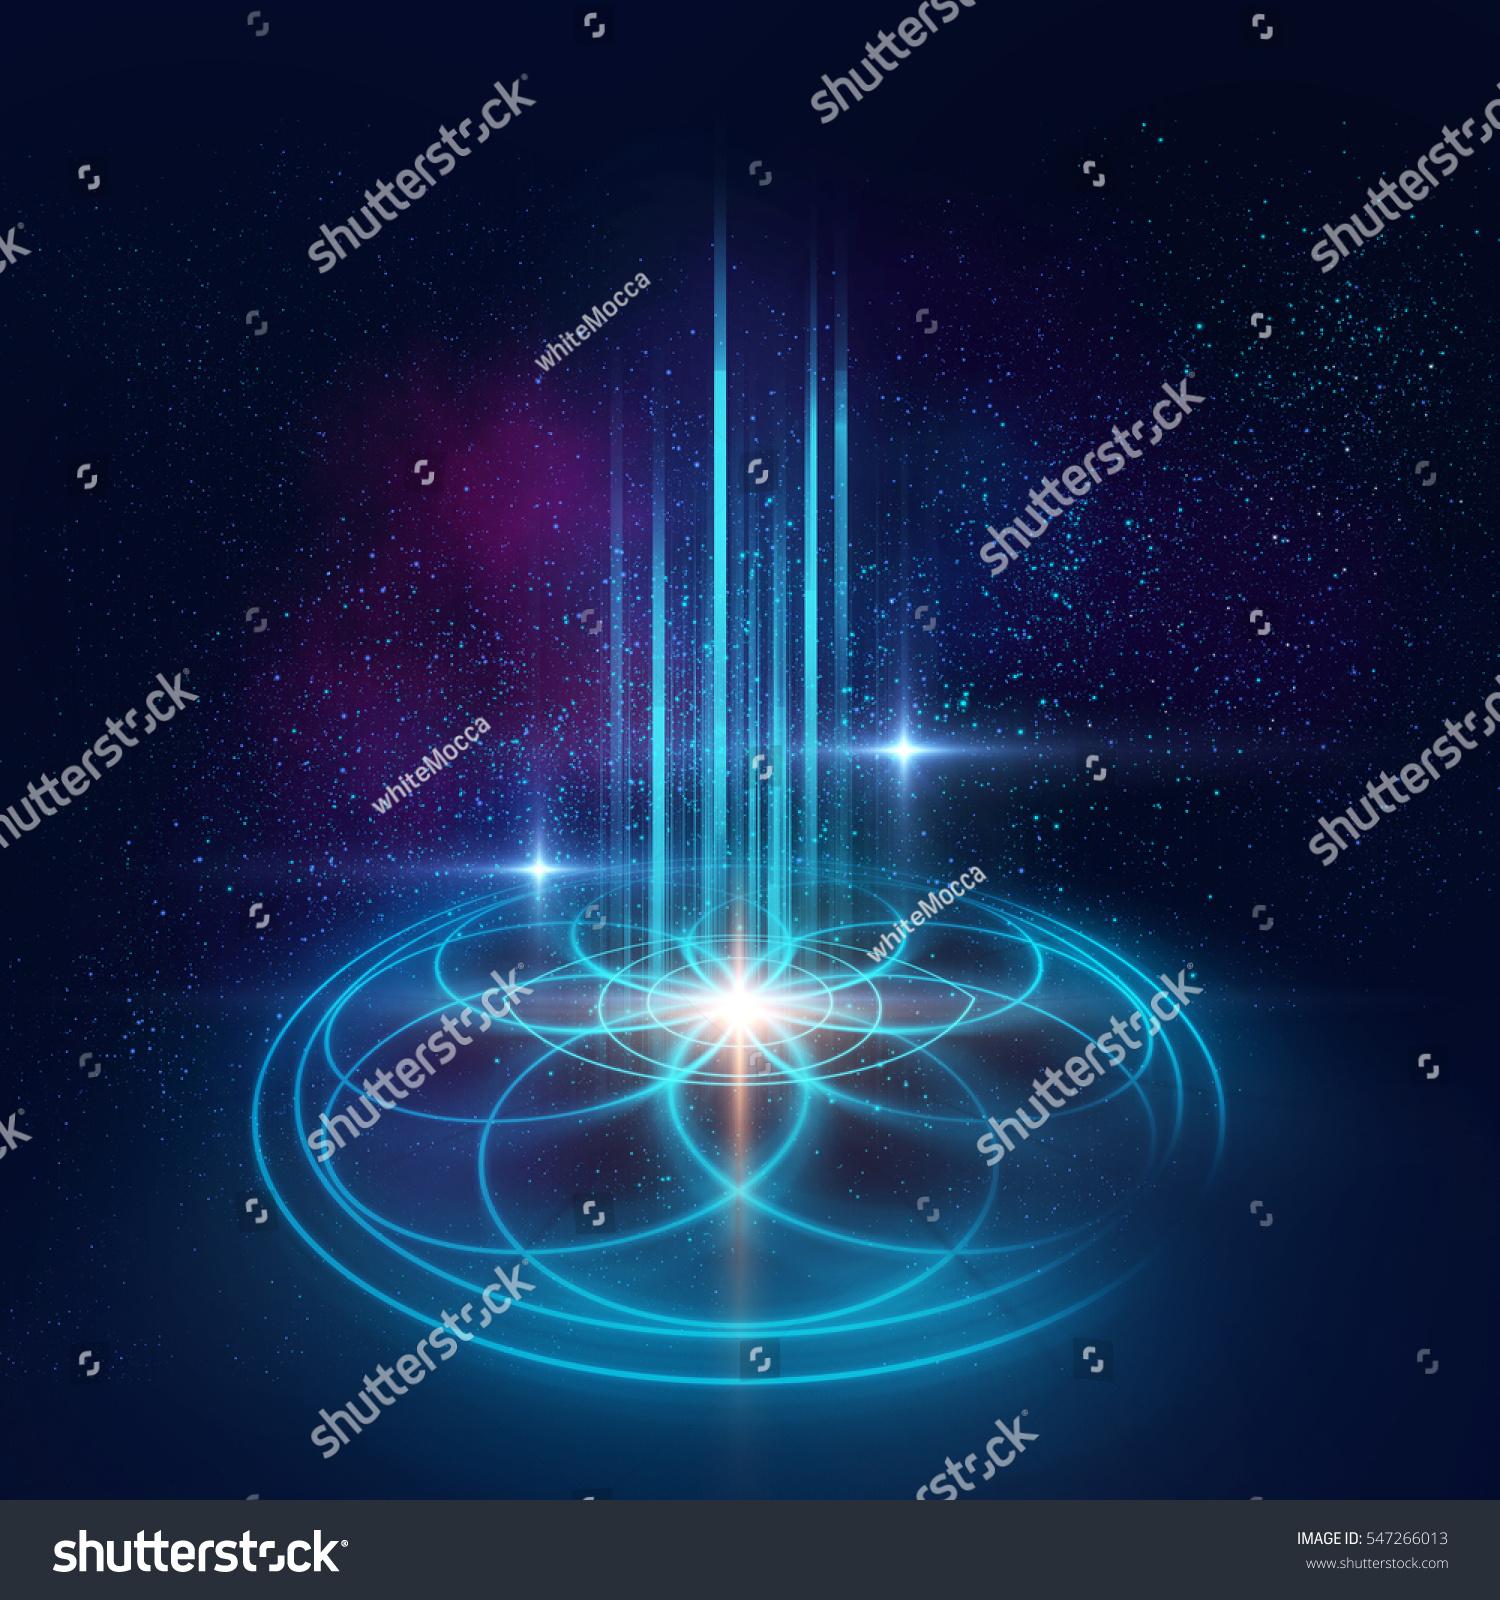 shutterstock cosmic art science - photo #43